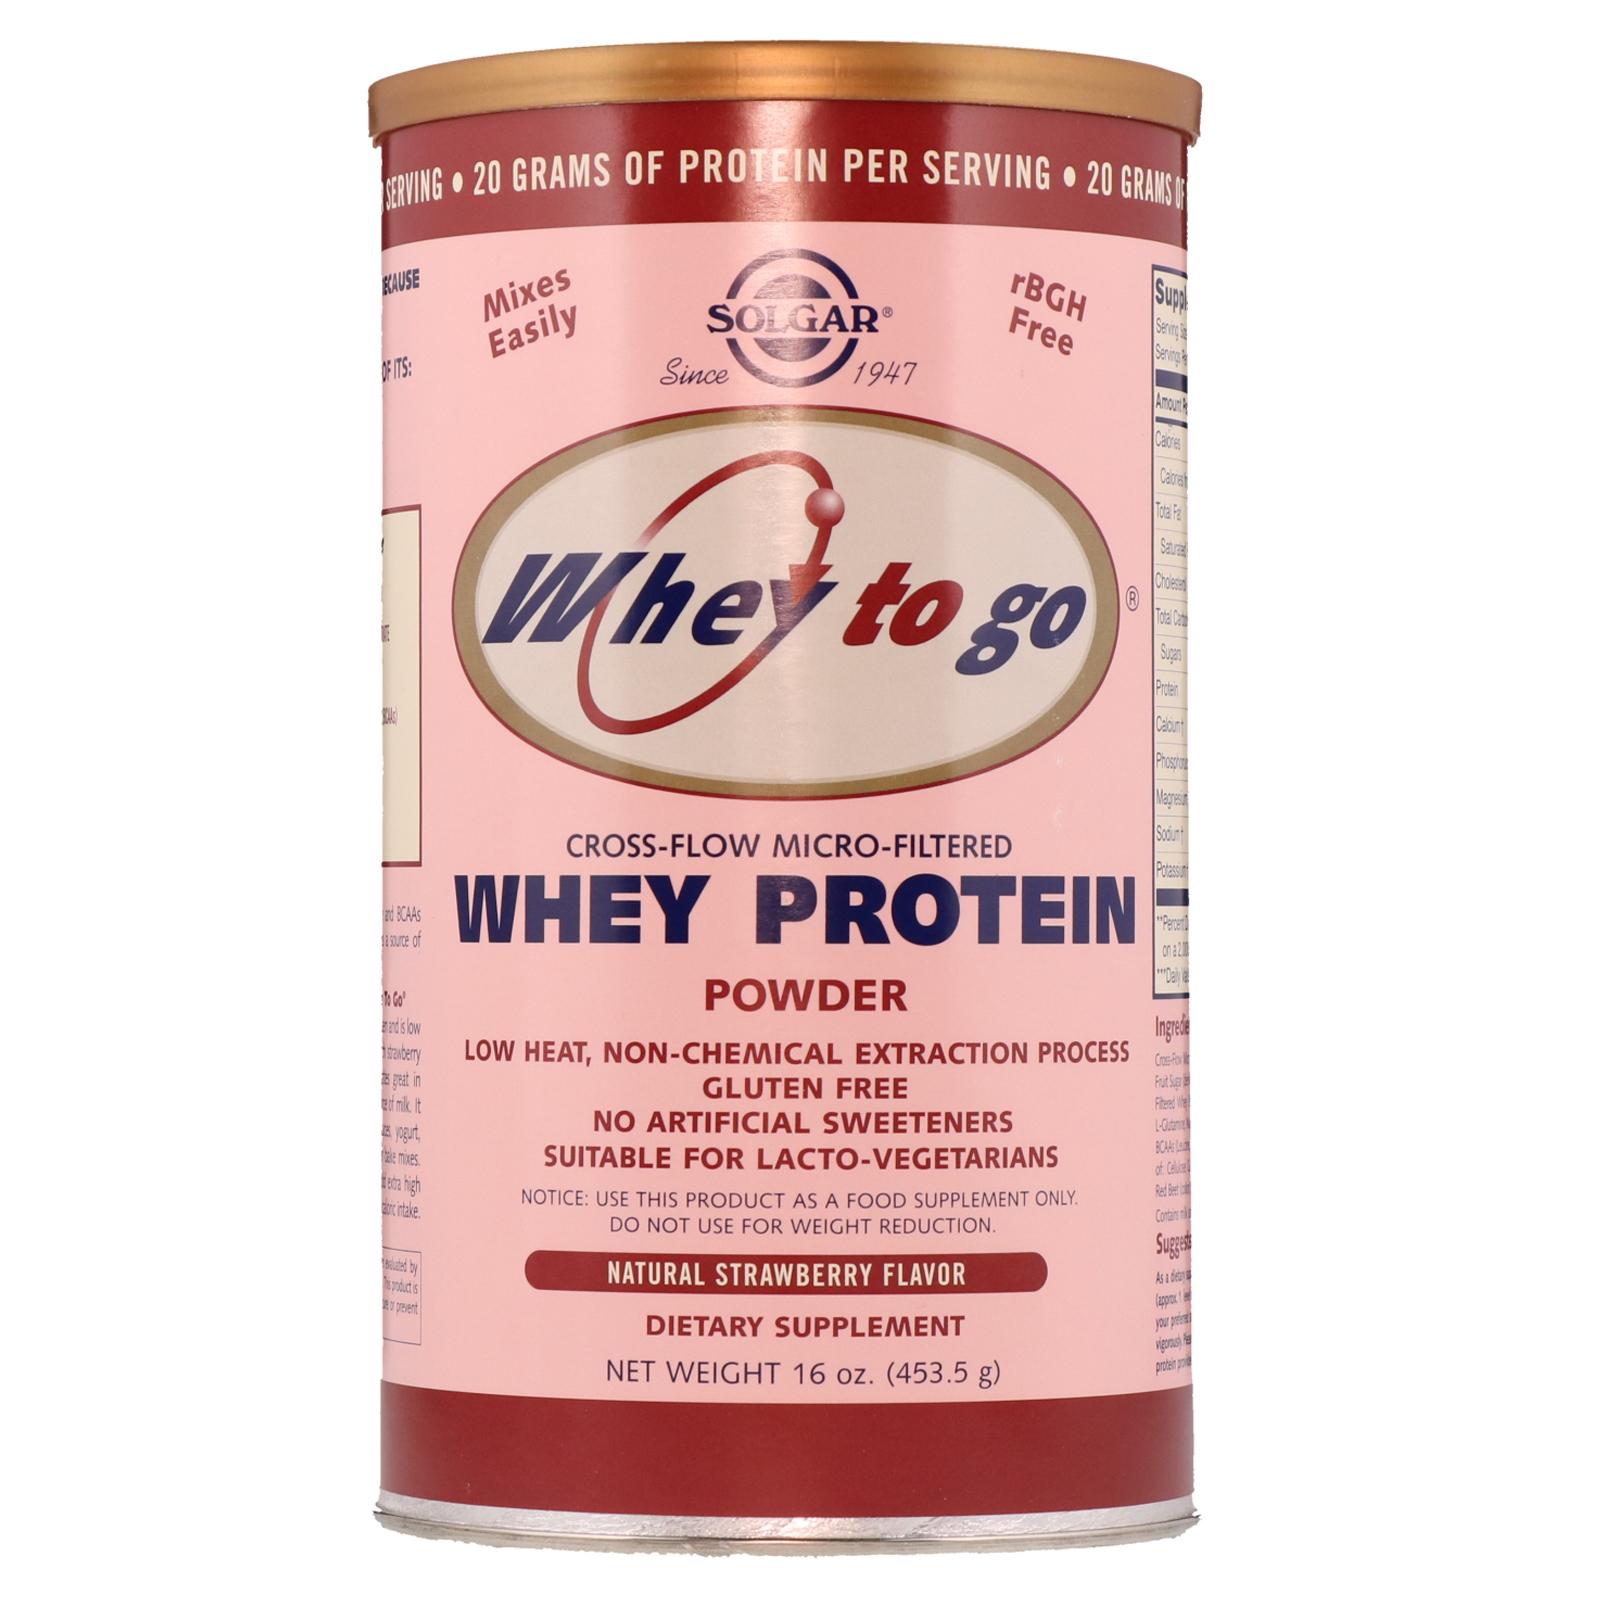 Natural Edge Protein Powder Reviews